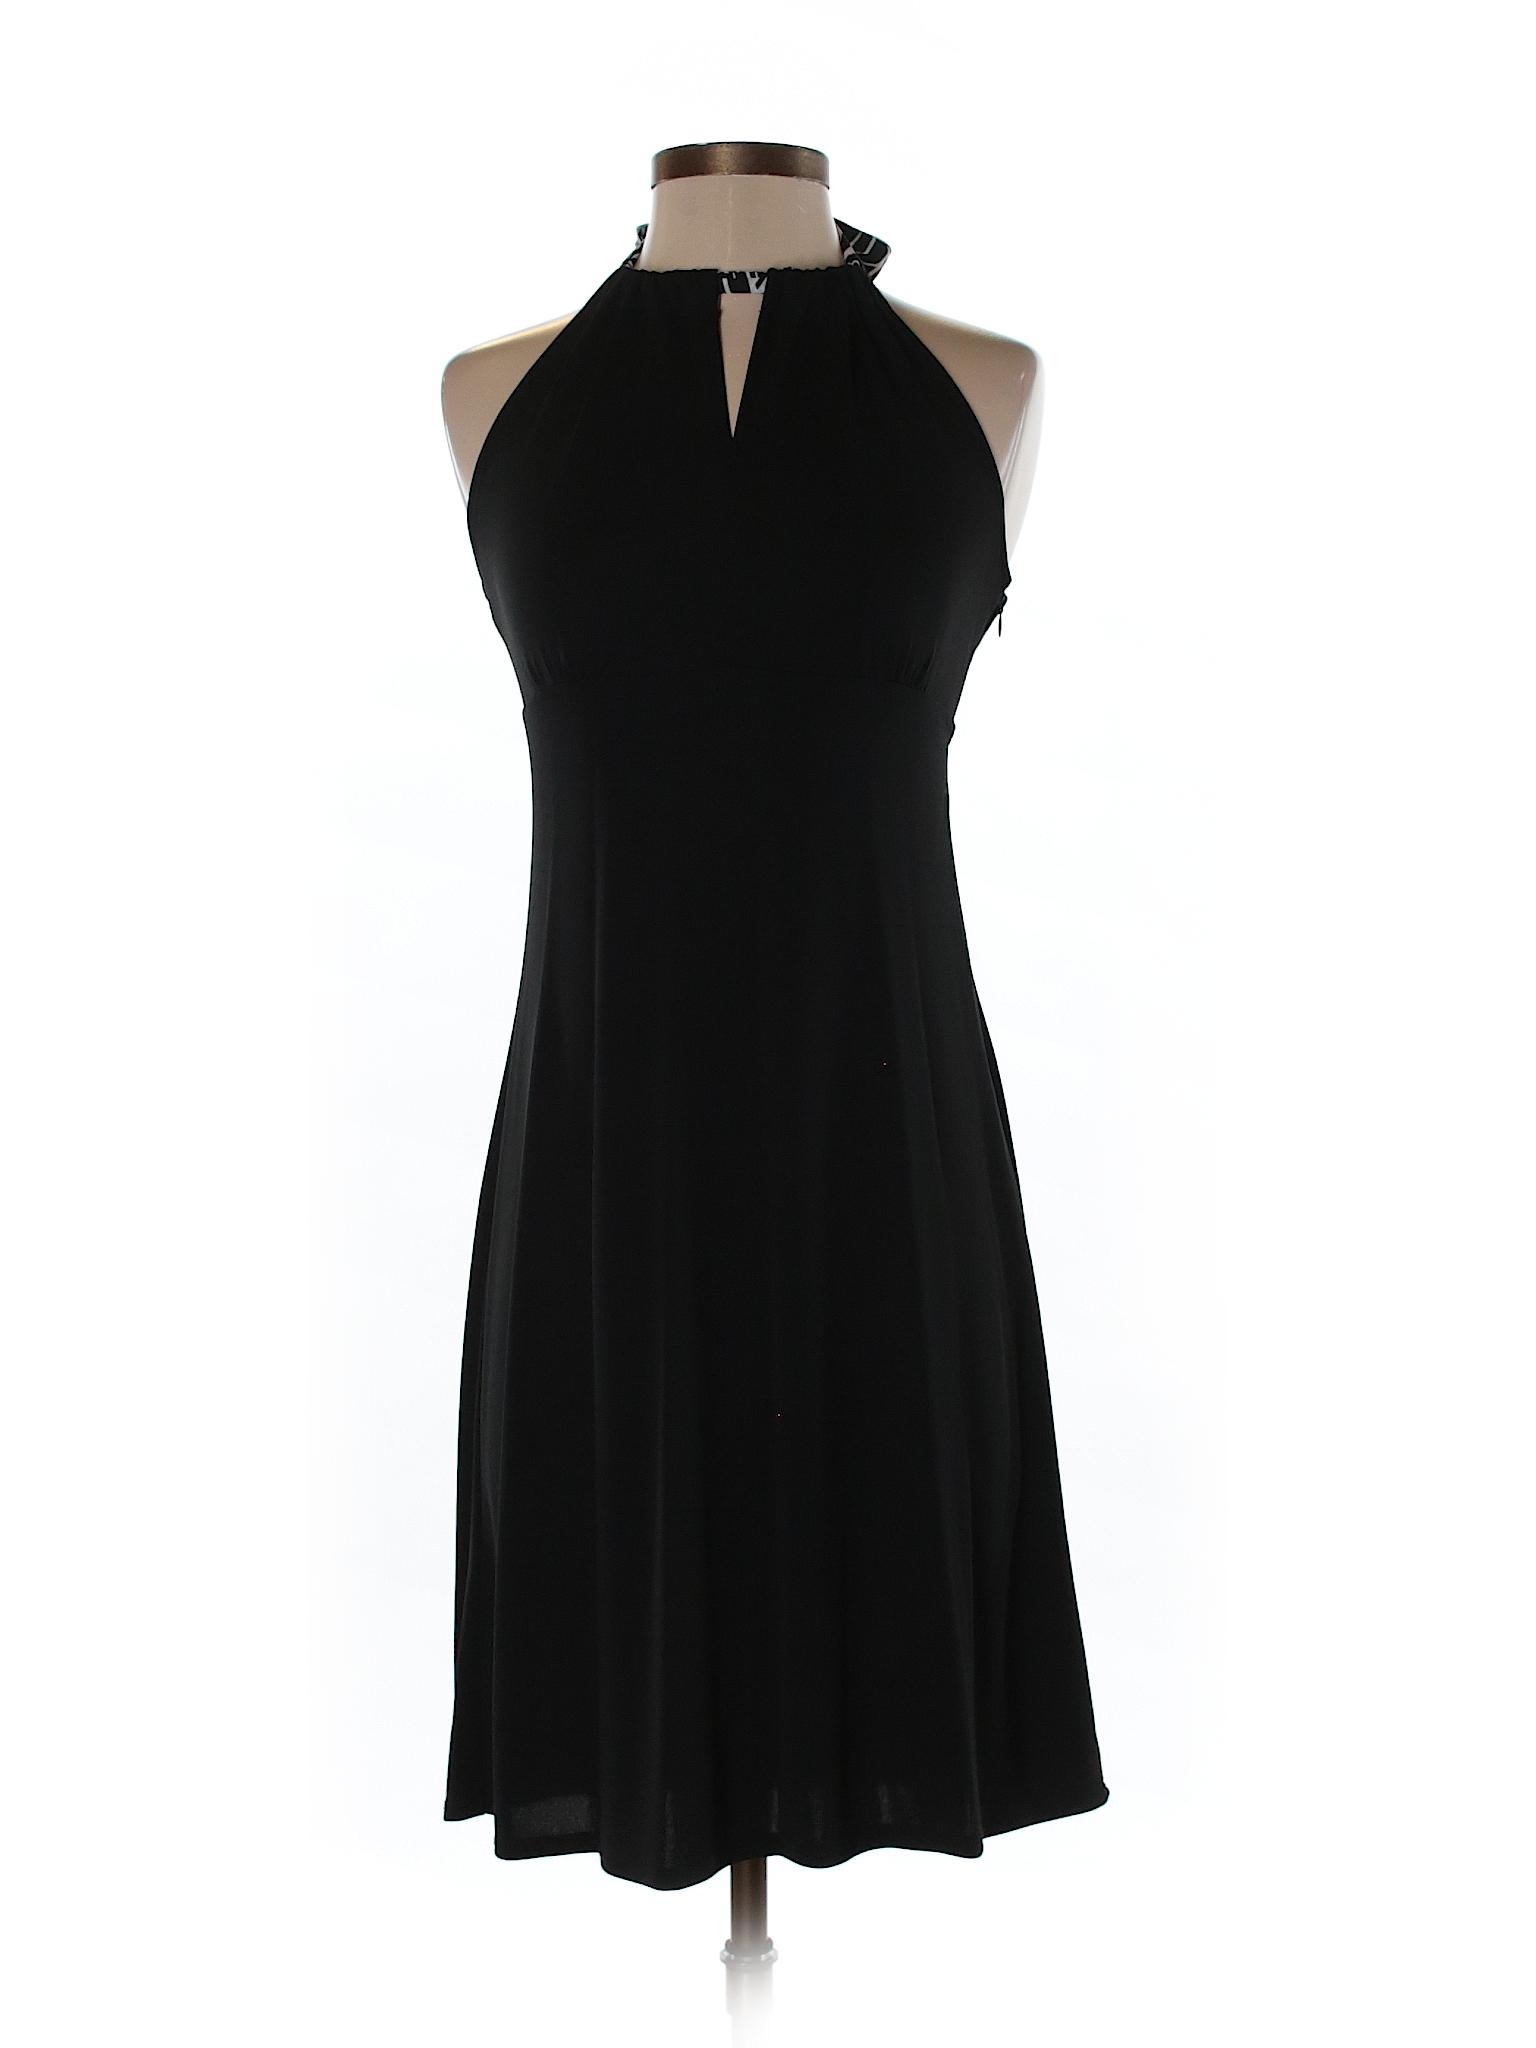 Taylor Casual Dress winter Boutique Ann LOFT qEwSI